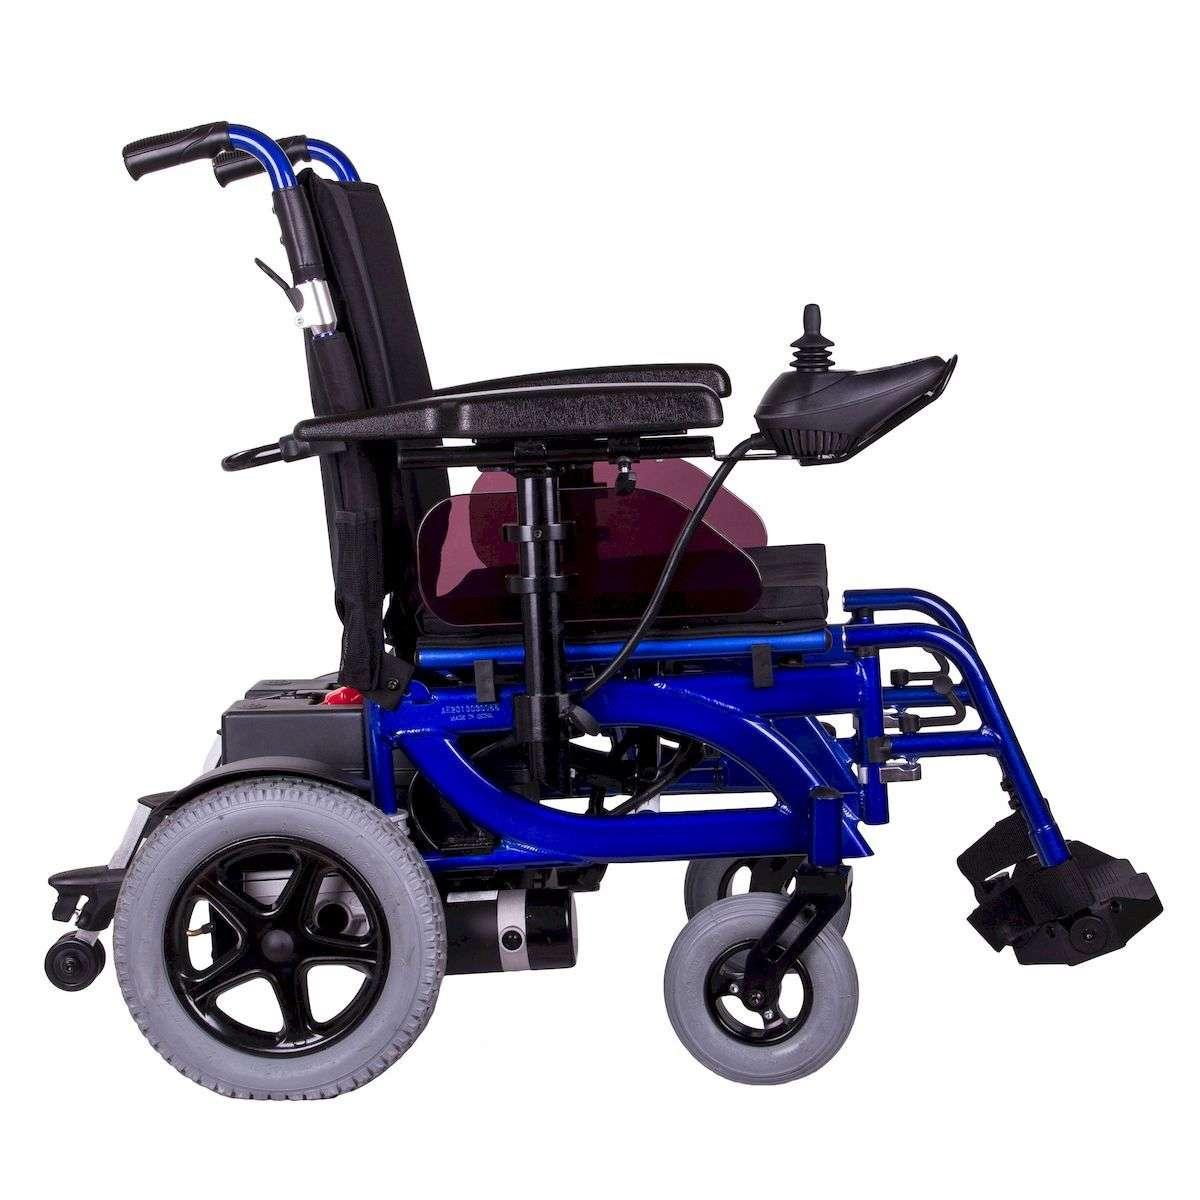 Складная коляска с электроприводом, OSD PCC